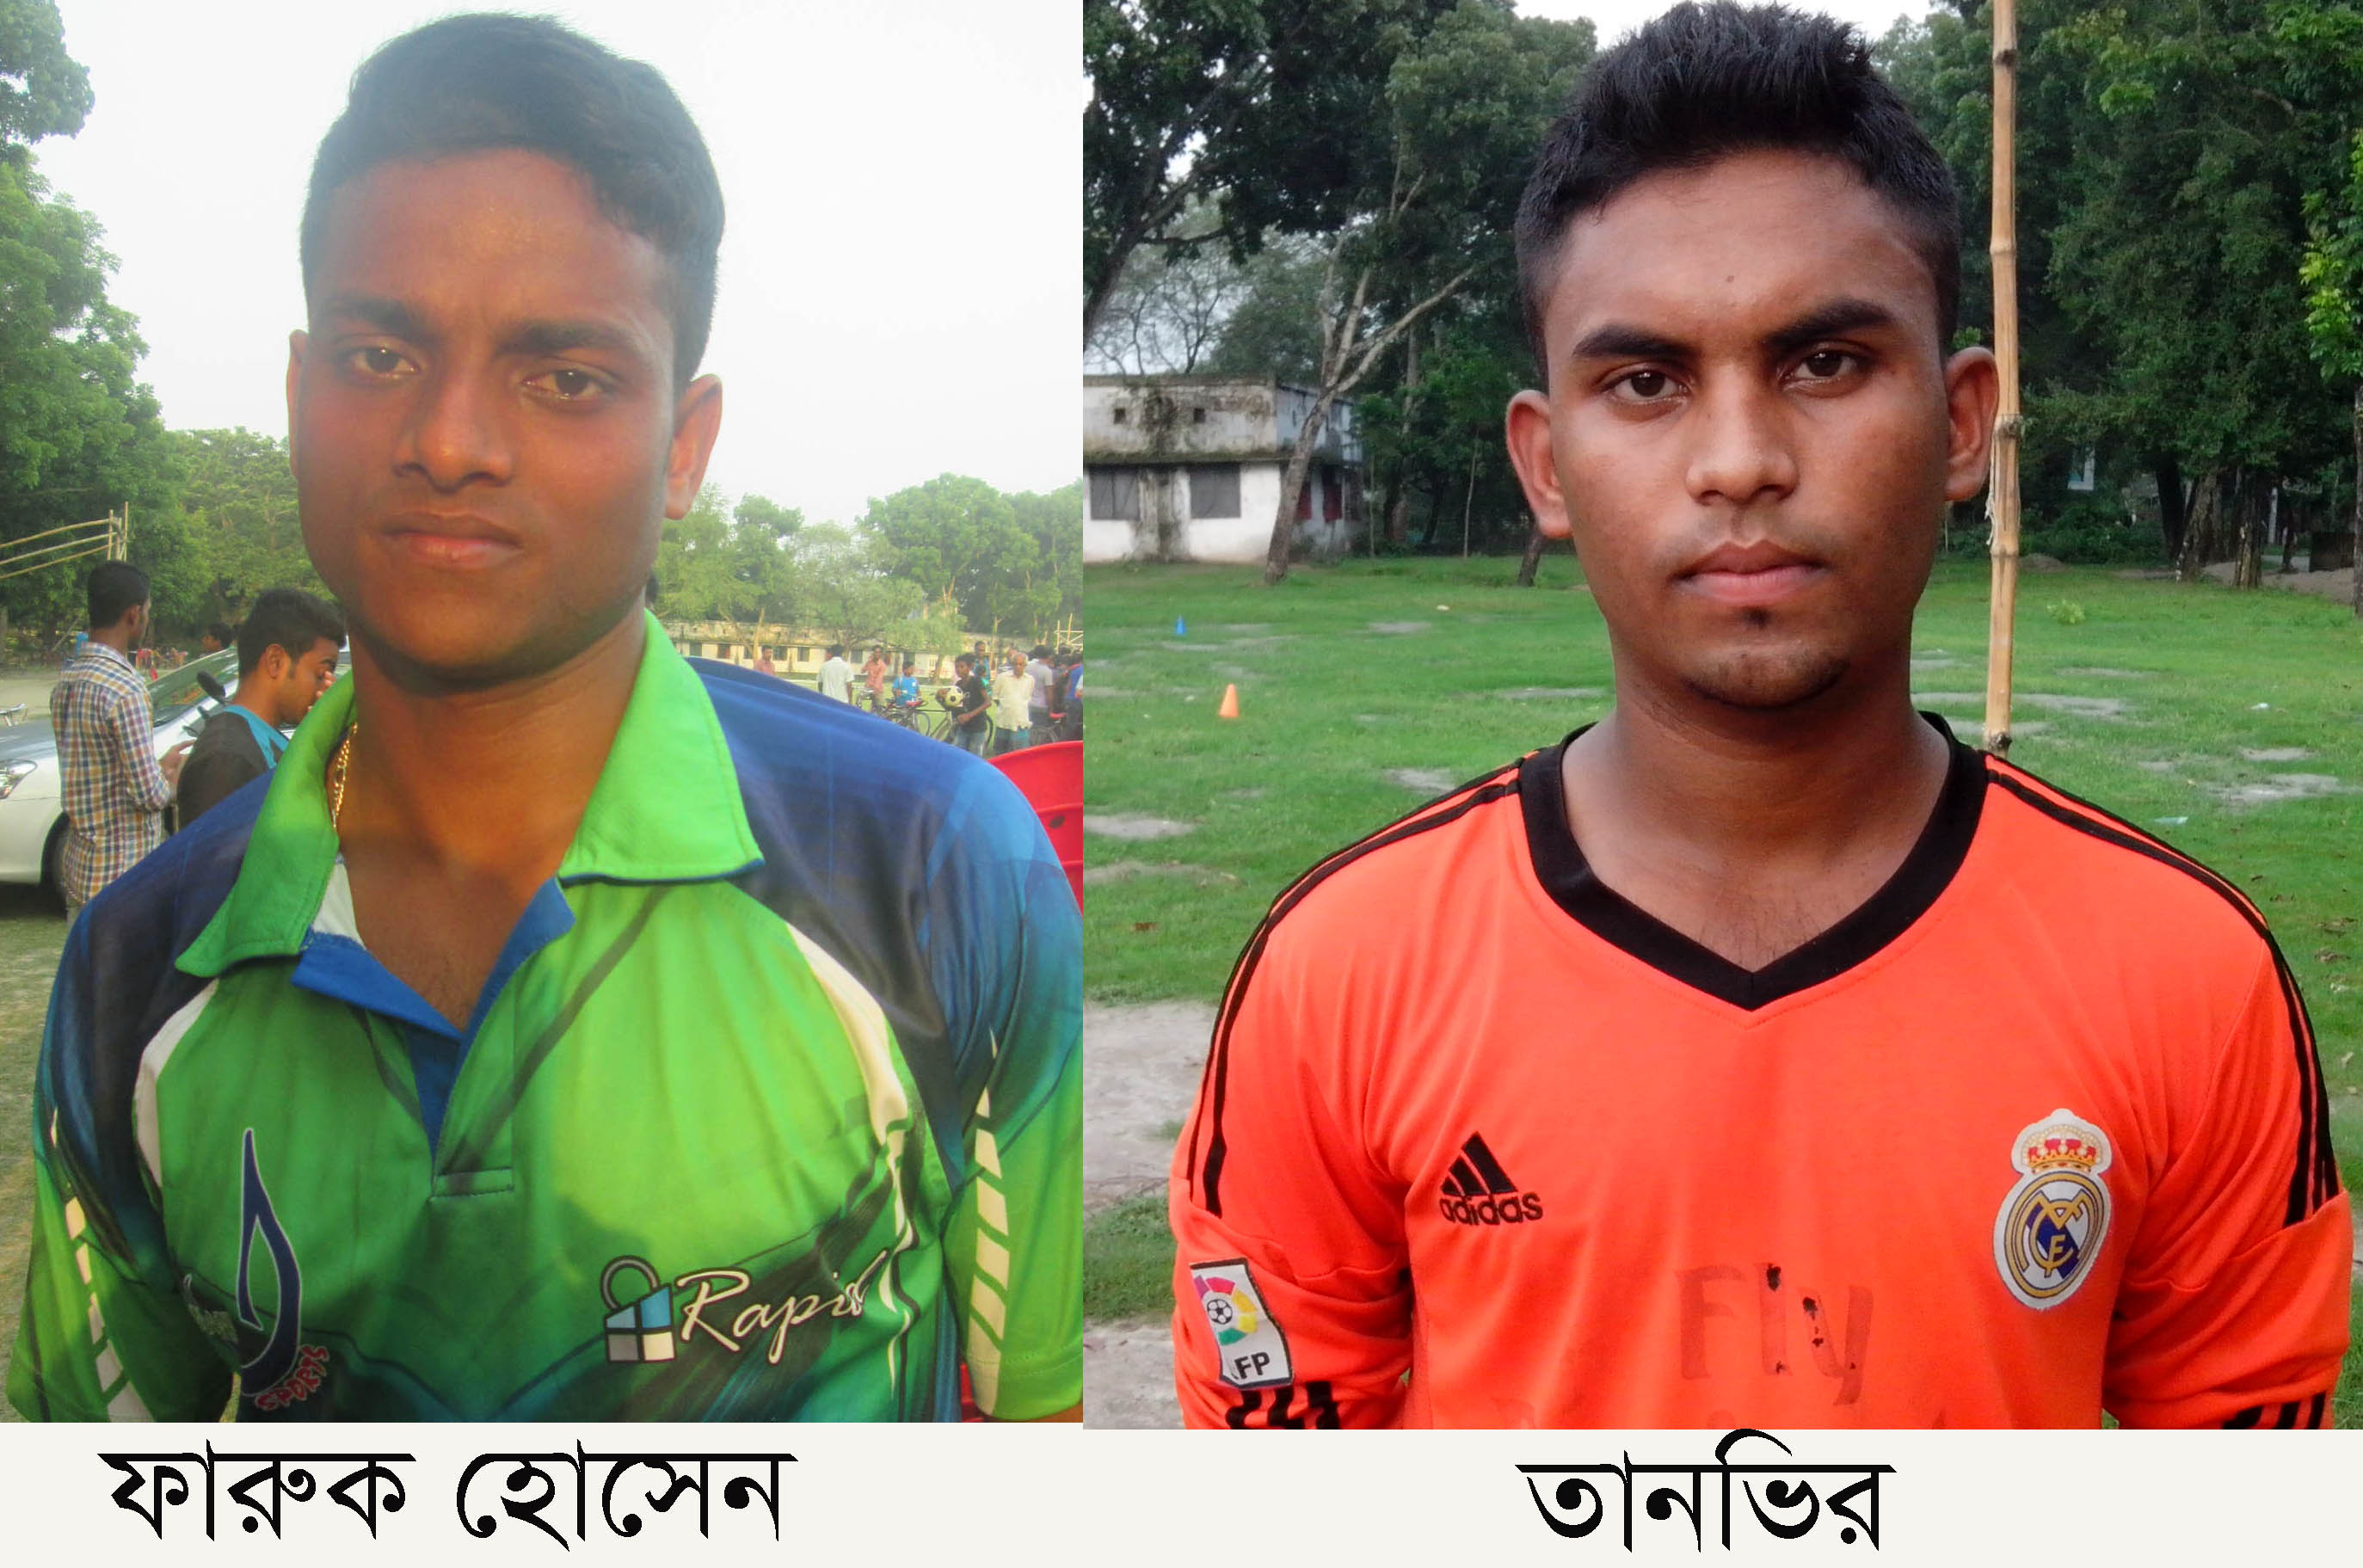 cricket pic satkhira asad